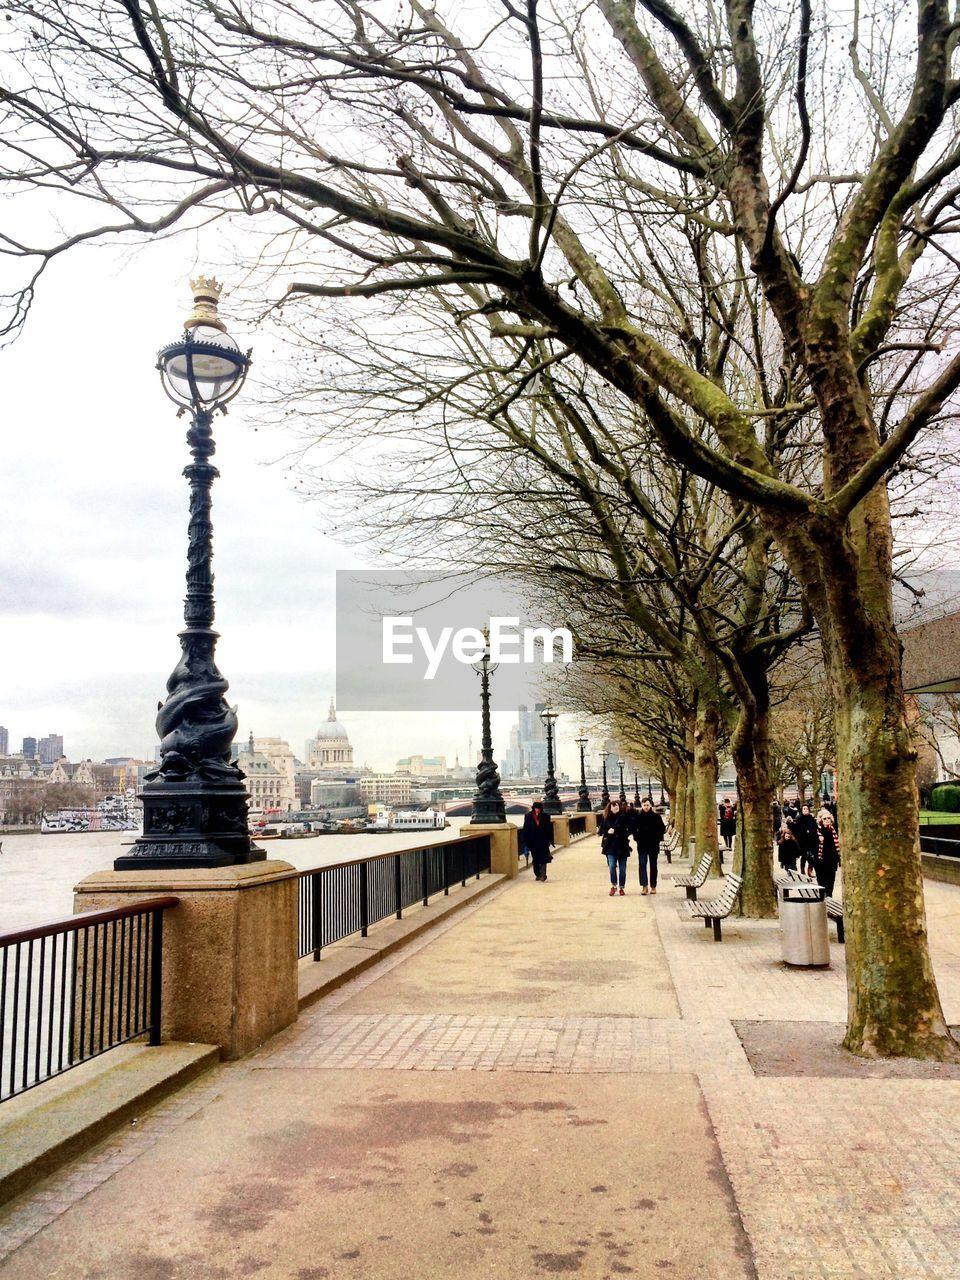 TOURISTS WALKING ON RIVERBANK